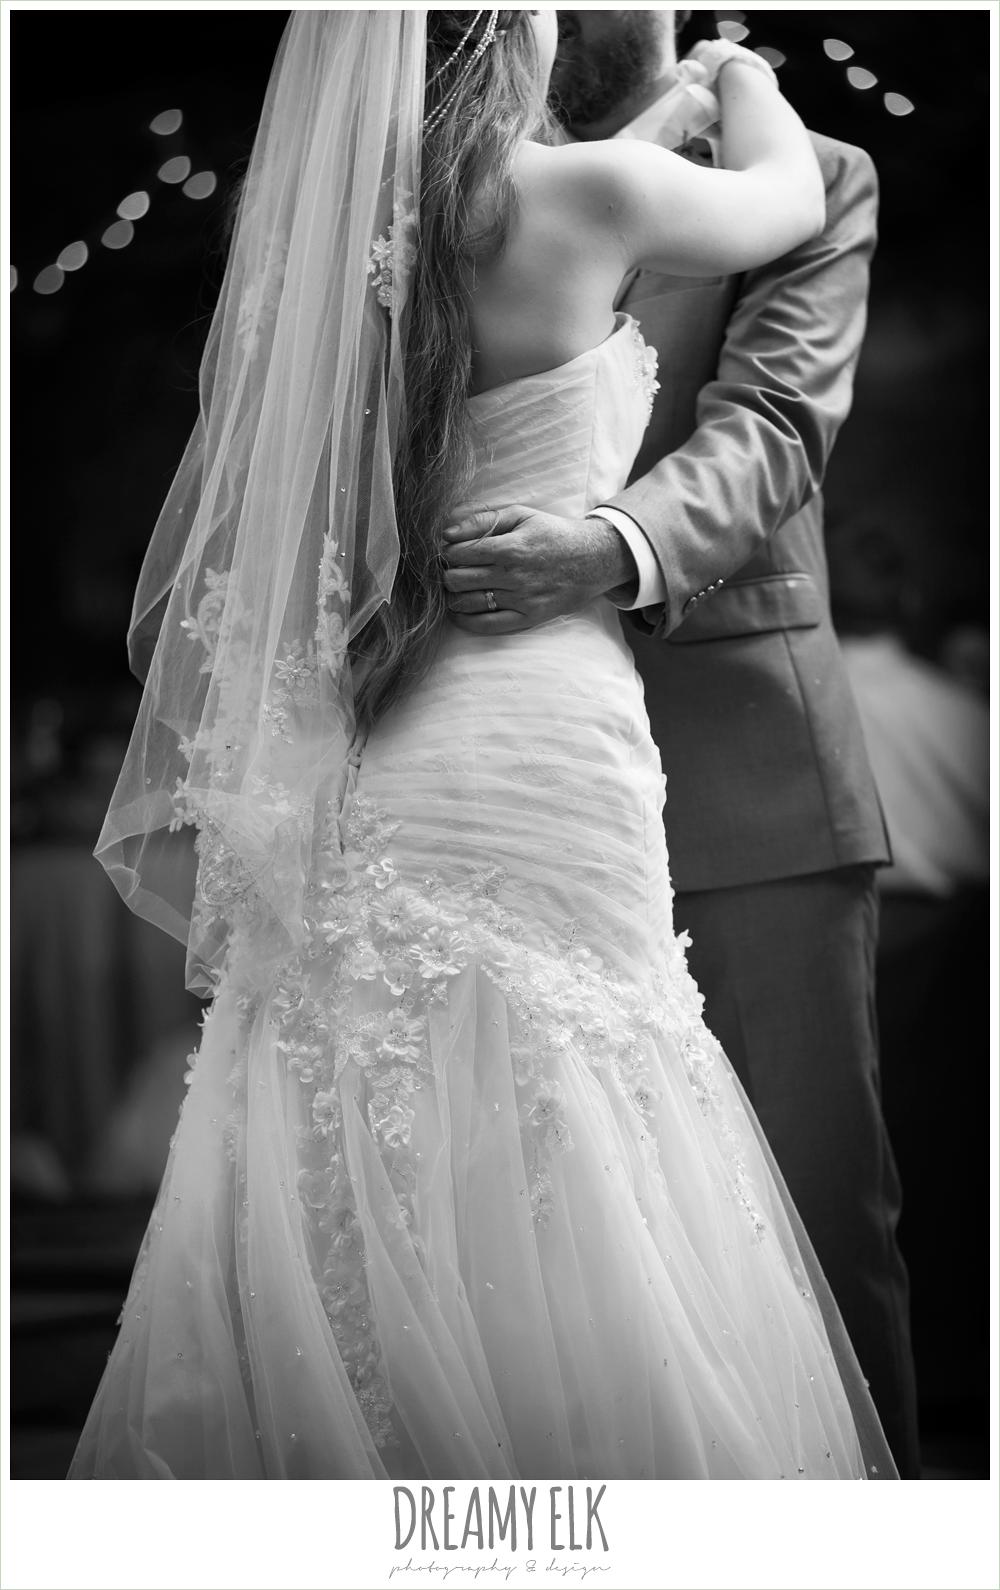 bride and groom's first dance, groom in gray suit, off the shoulder mermaid wedding dress, le jardin winter wedding {dreamy elk photography and design}